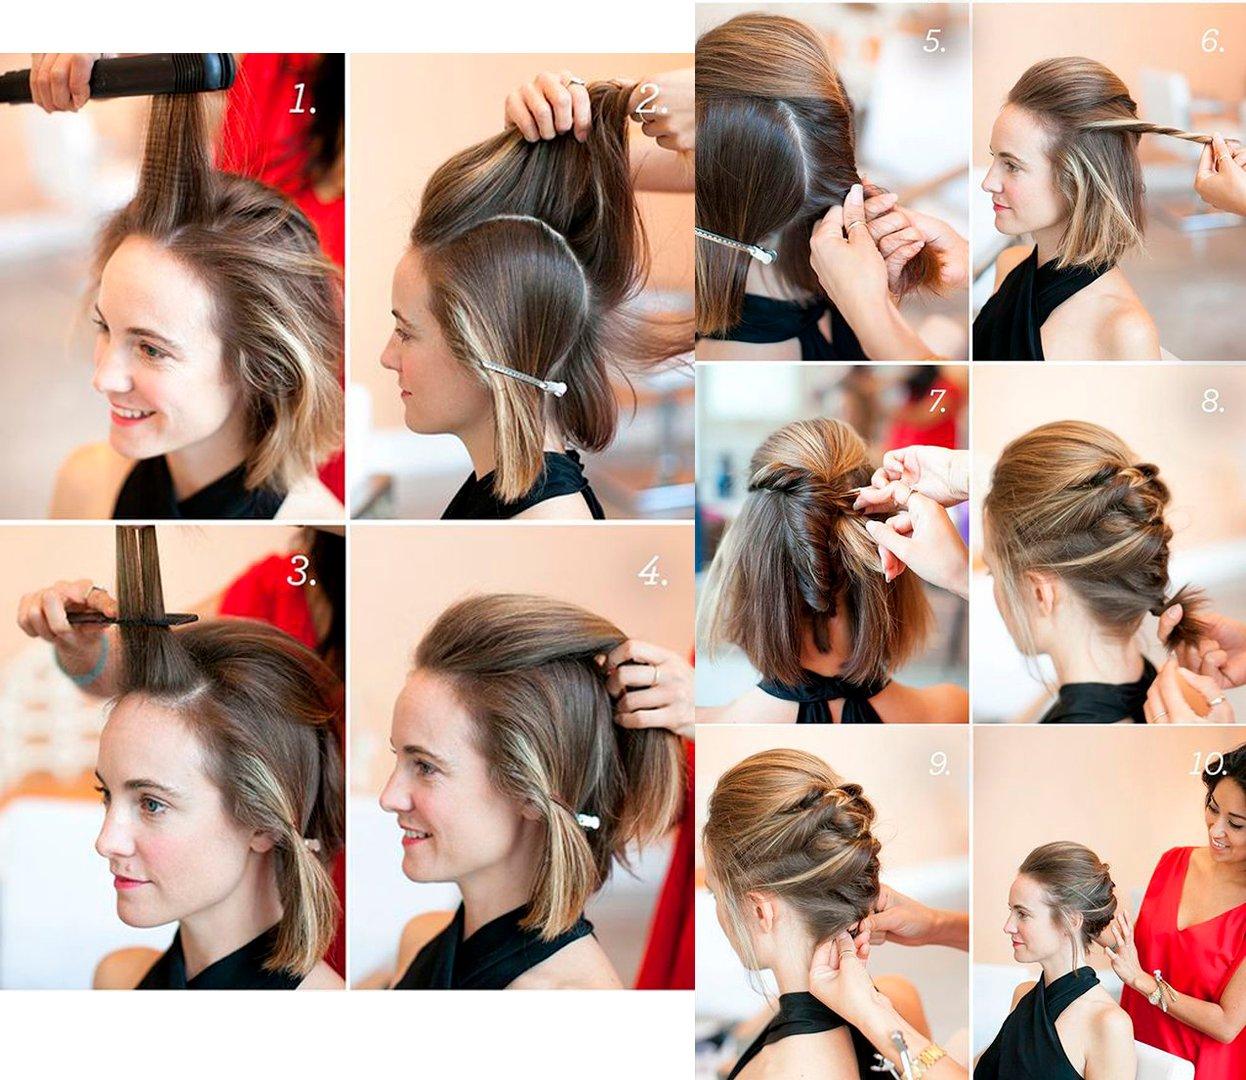 La medicina pública de la alopecia